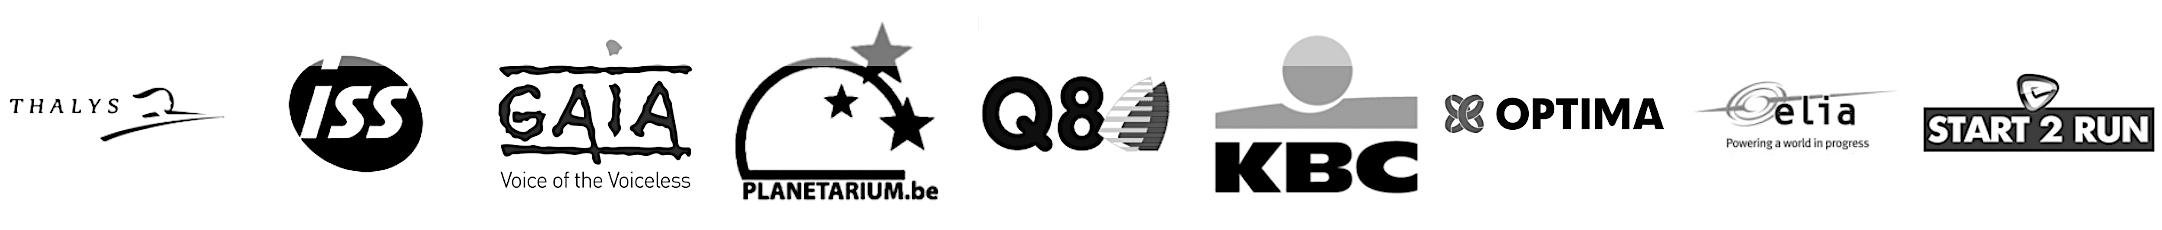 Klanten logos BW 230h 1